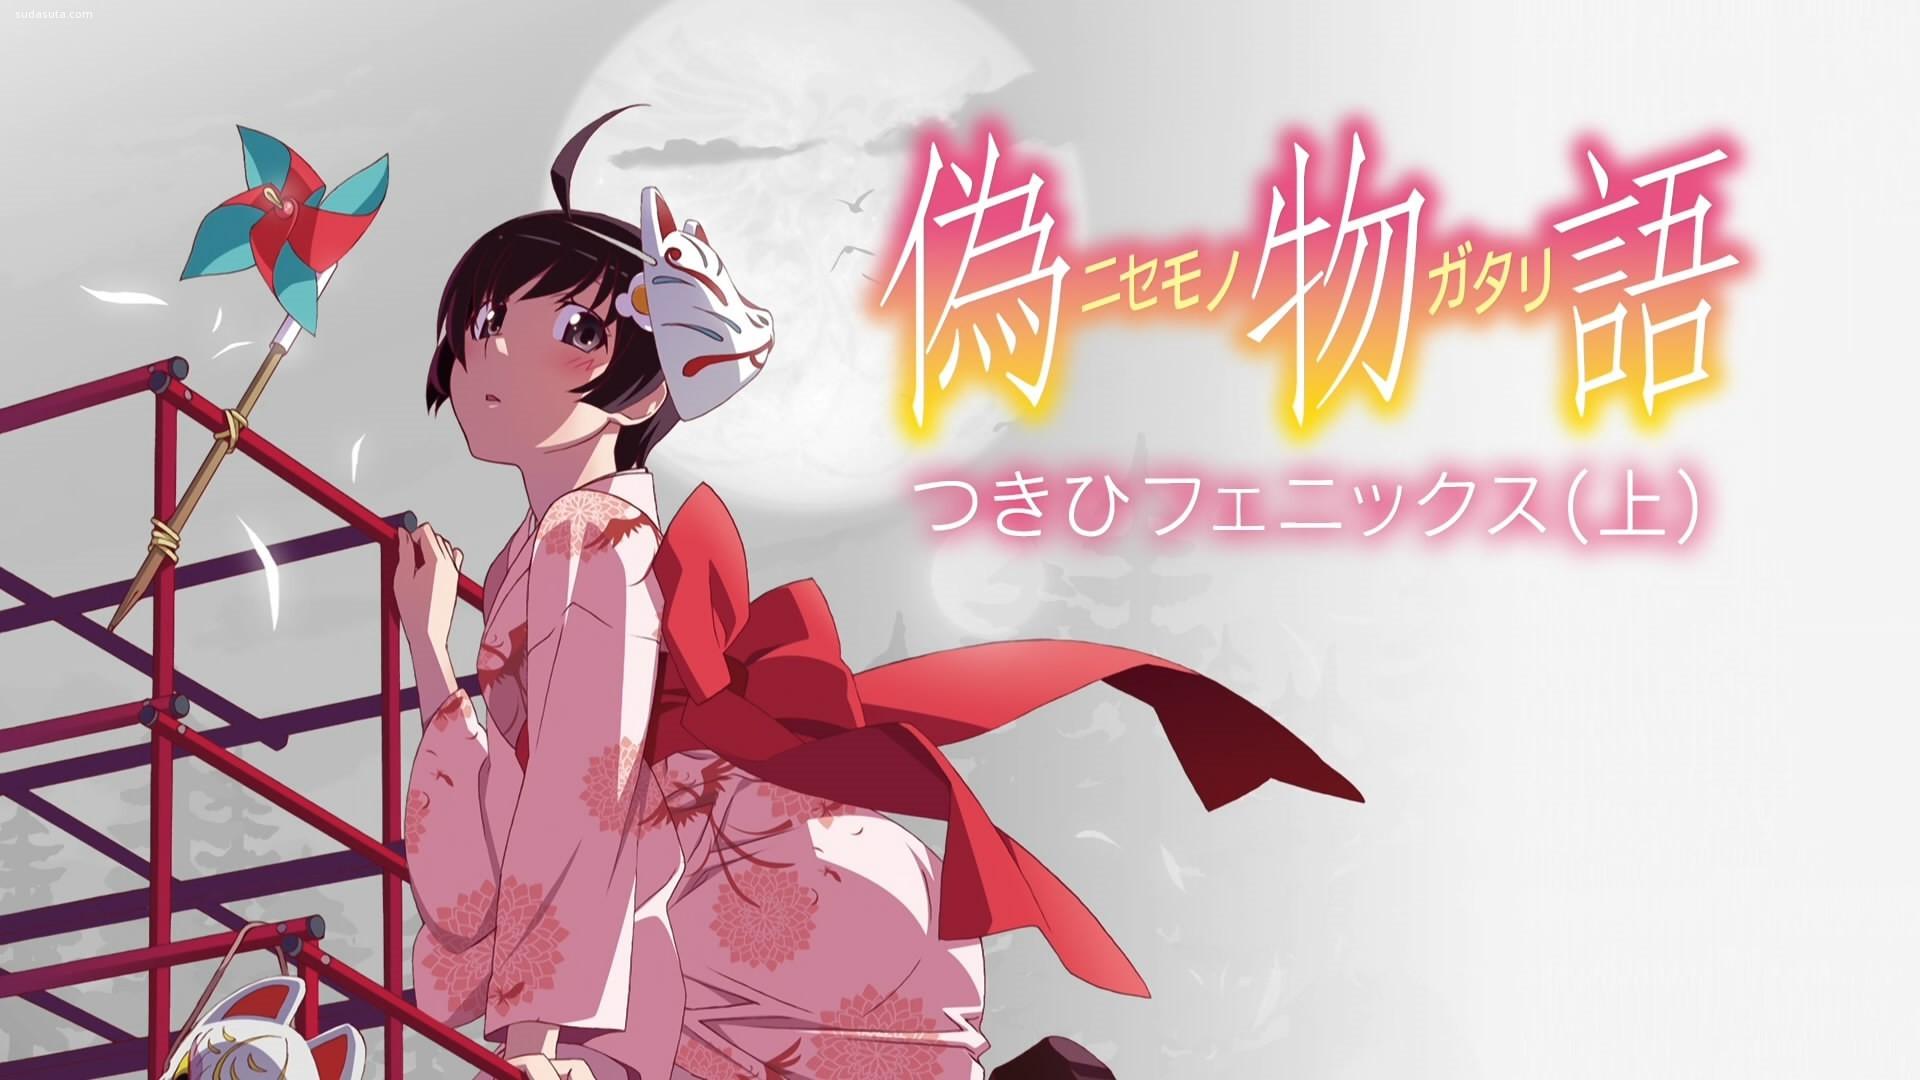 《物语系列》主题动漫CG欣赏